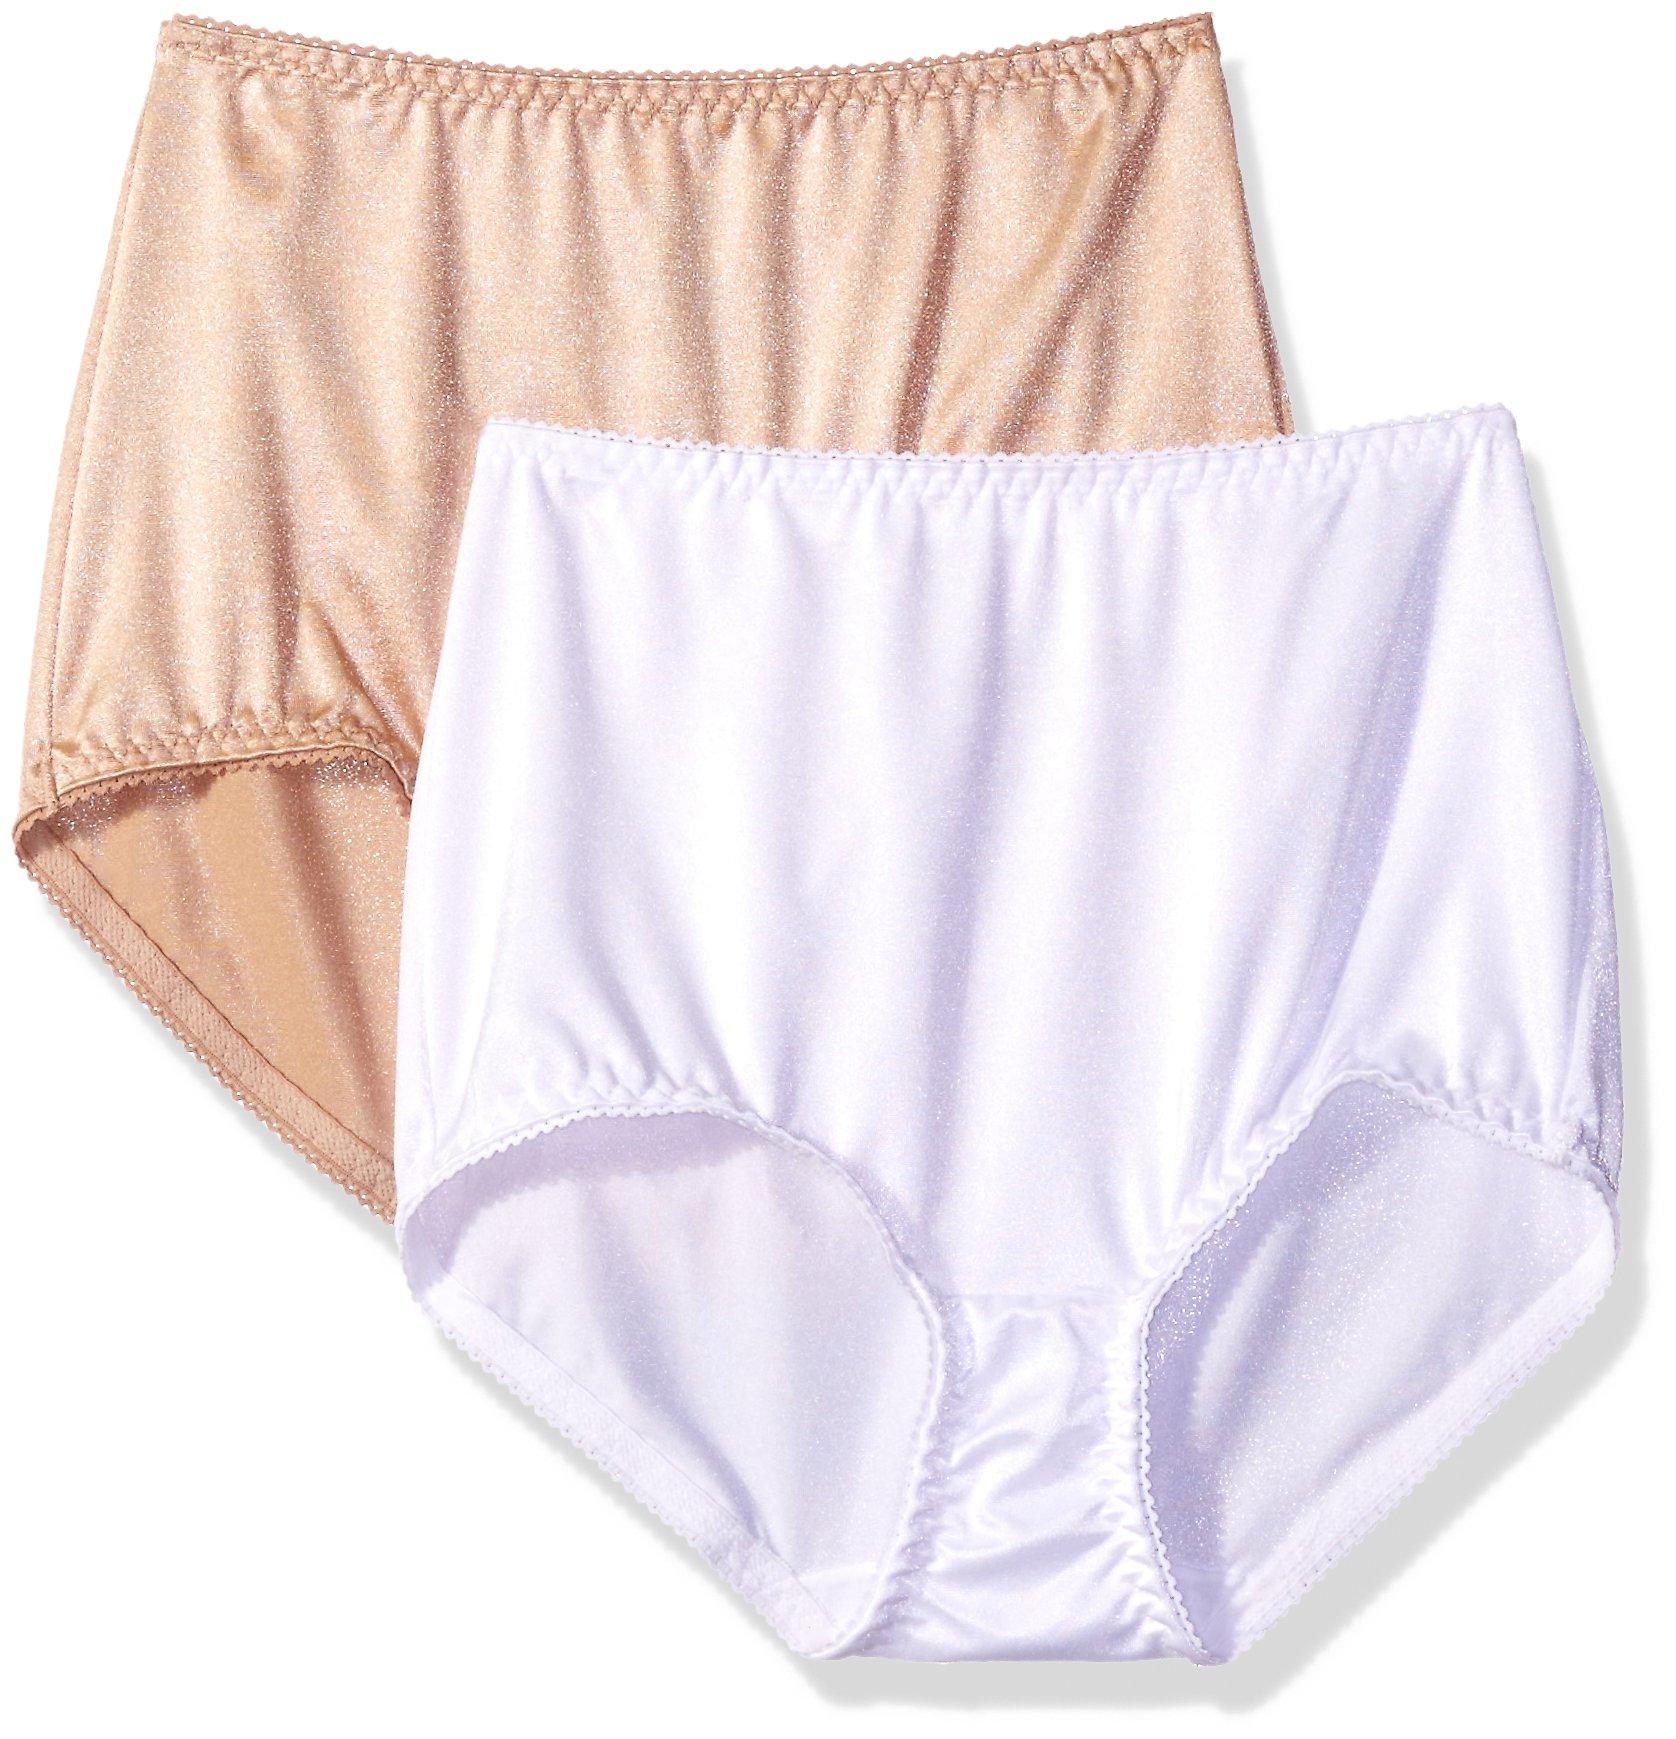 84bbbeb797 Vassarette Womens Undershapers 2-Pack Light Control Brief 40201 Shapewear  Brief